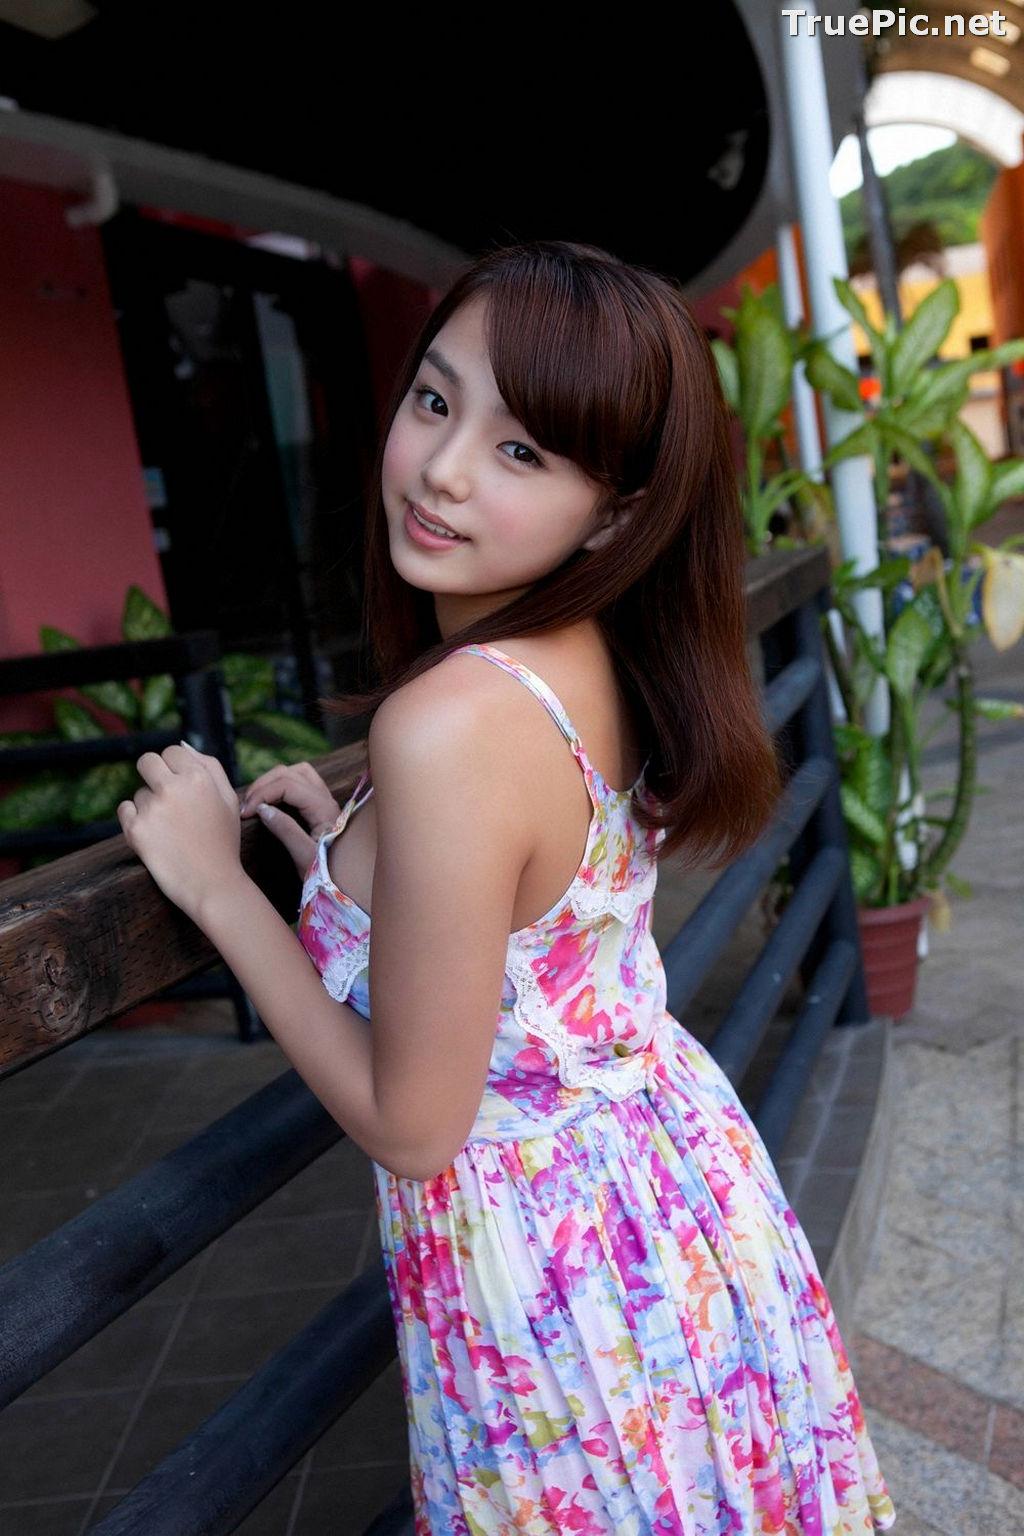 Image [YS Web] Vol.465 – Japanese Model Ai Shinozaki – Mermaid of Love Photo Album - TruePic.net - Picture-2